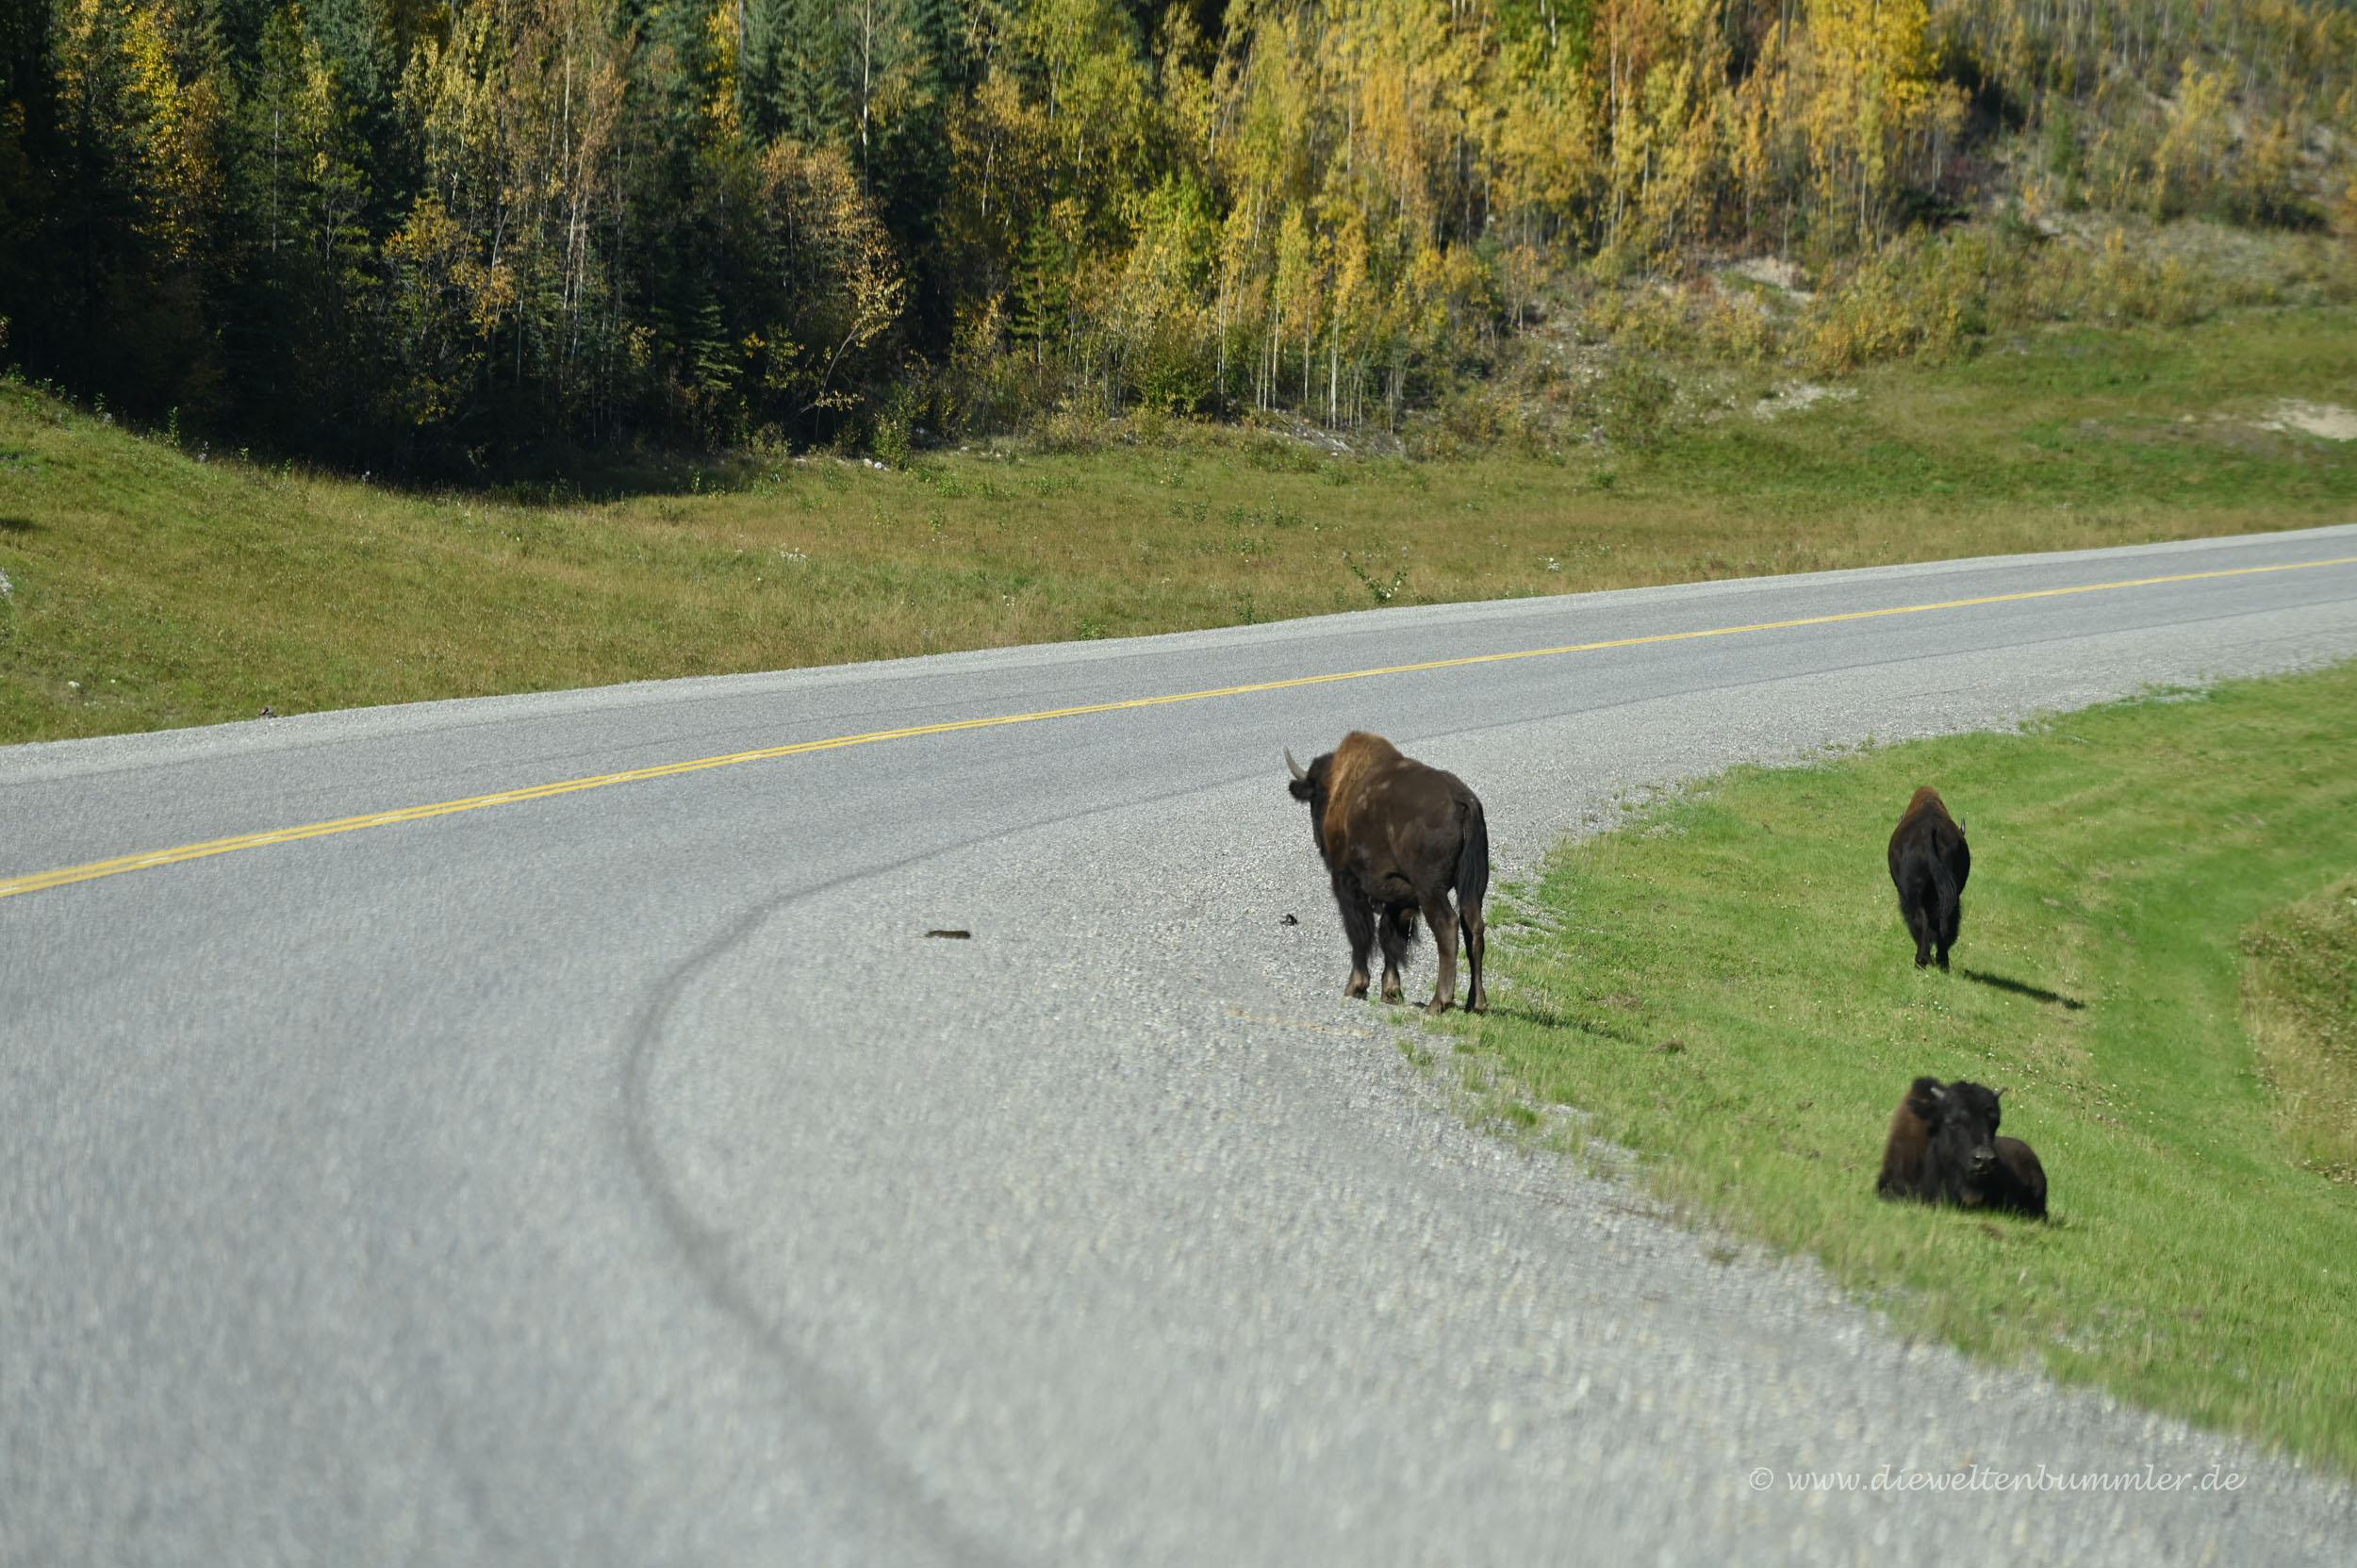 Bisons am Straßenrand